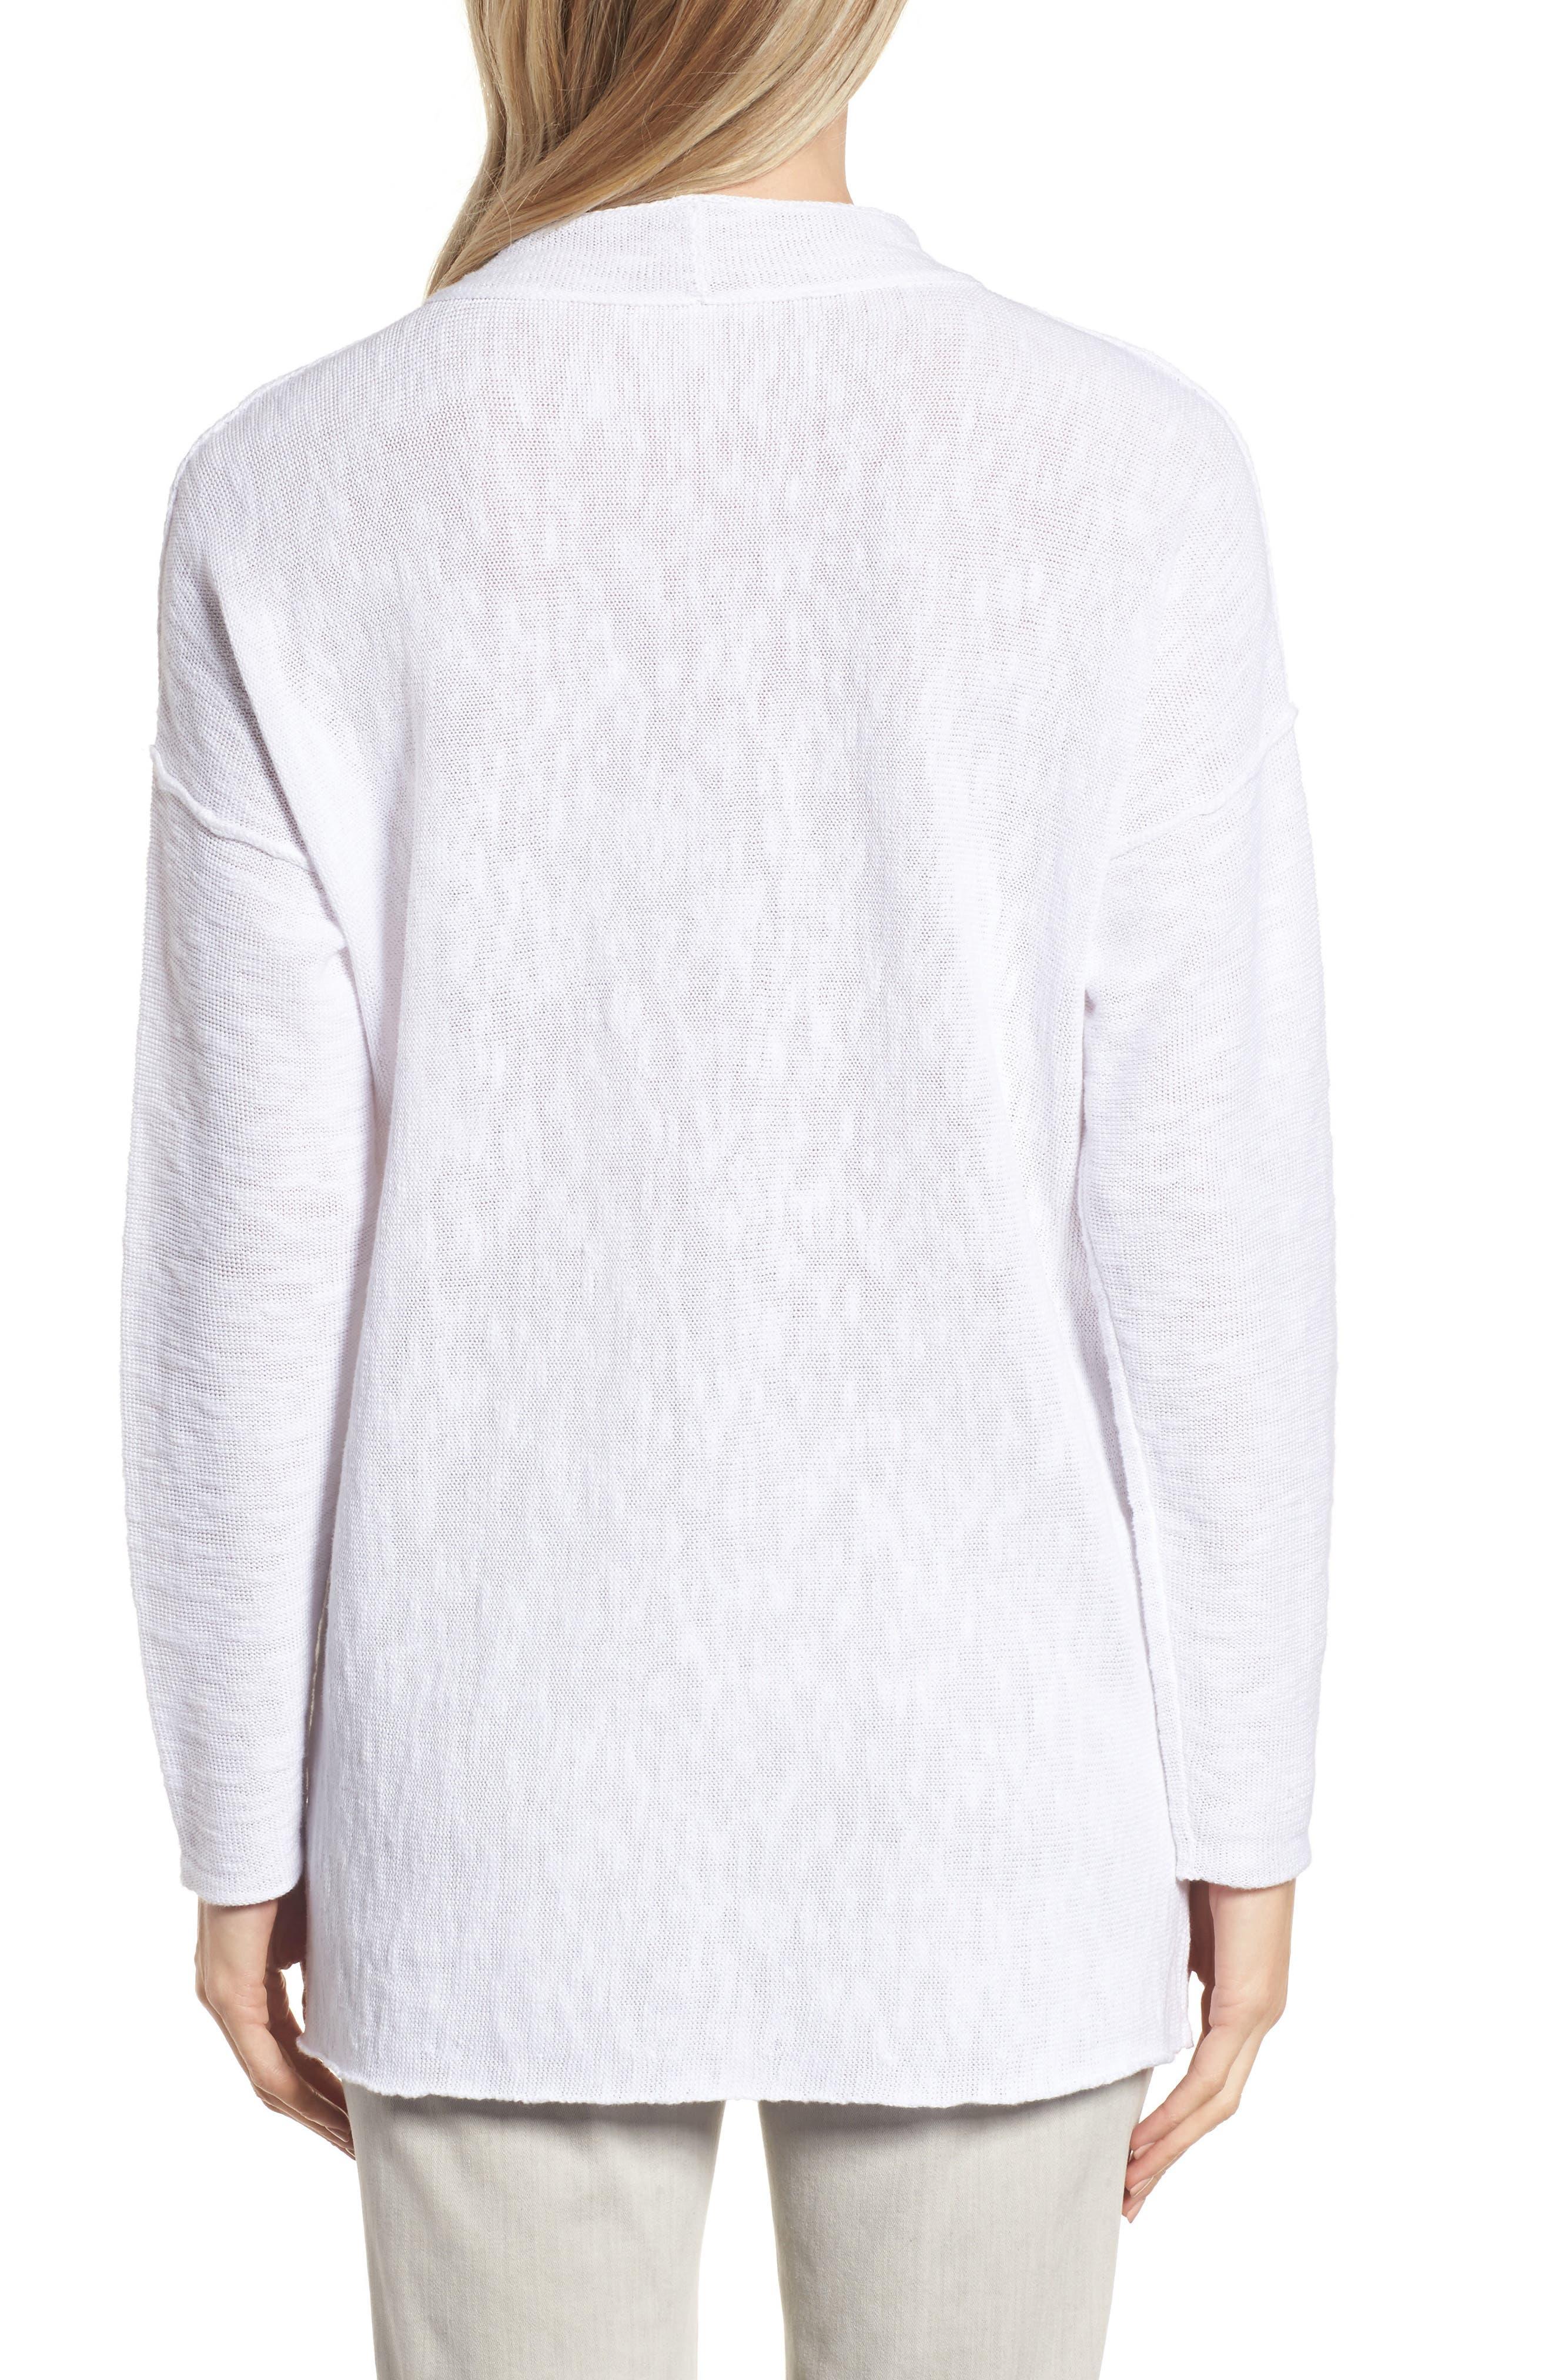 Organic Linen & Cotton Sweater,                             Alternate thumbnail 2, color,                             100